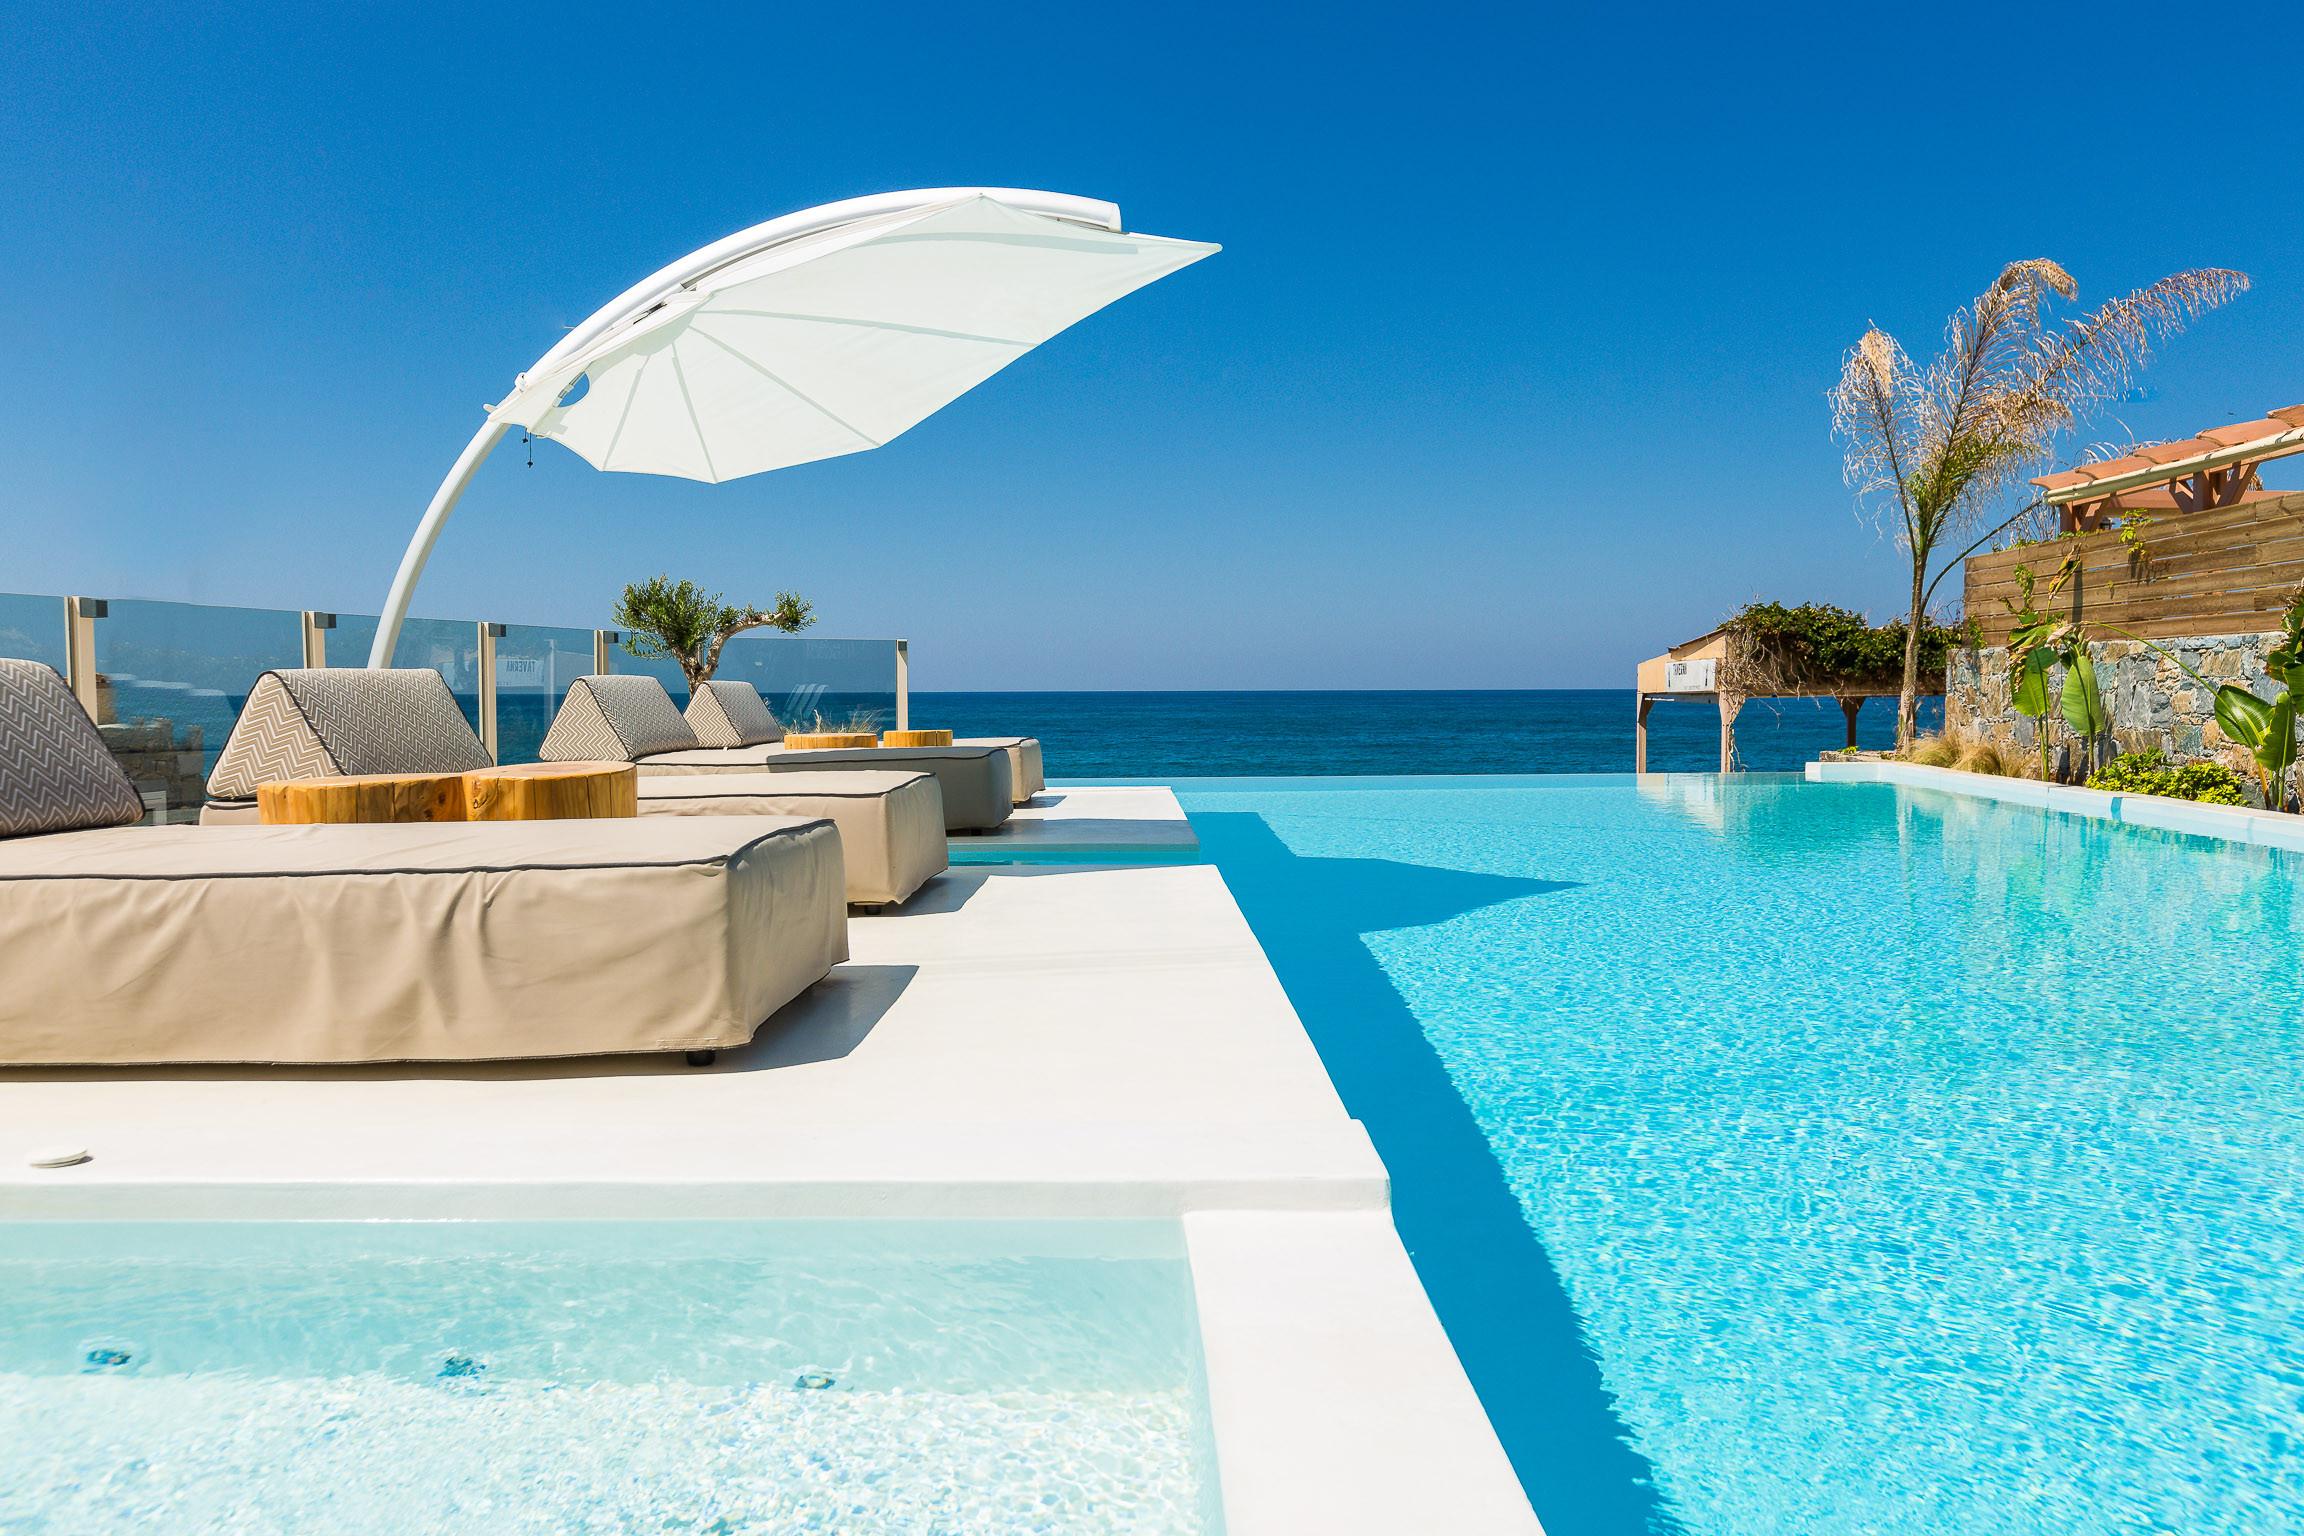 Icarus parasol déporté inclinable Casa di Mare Greece by Thinkvilla